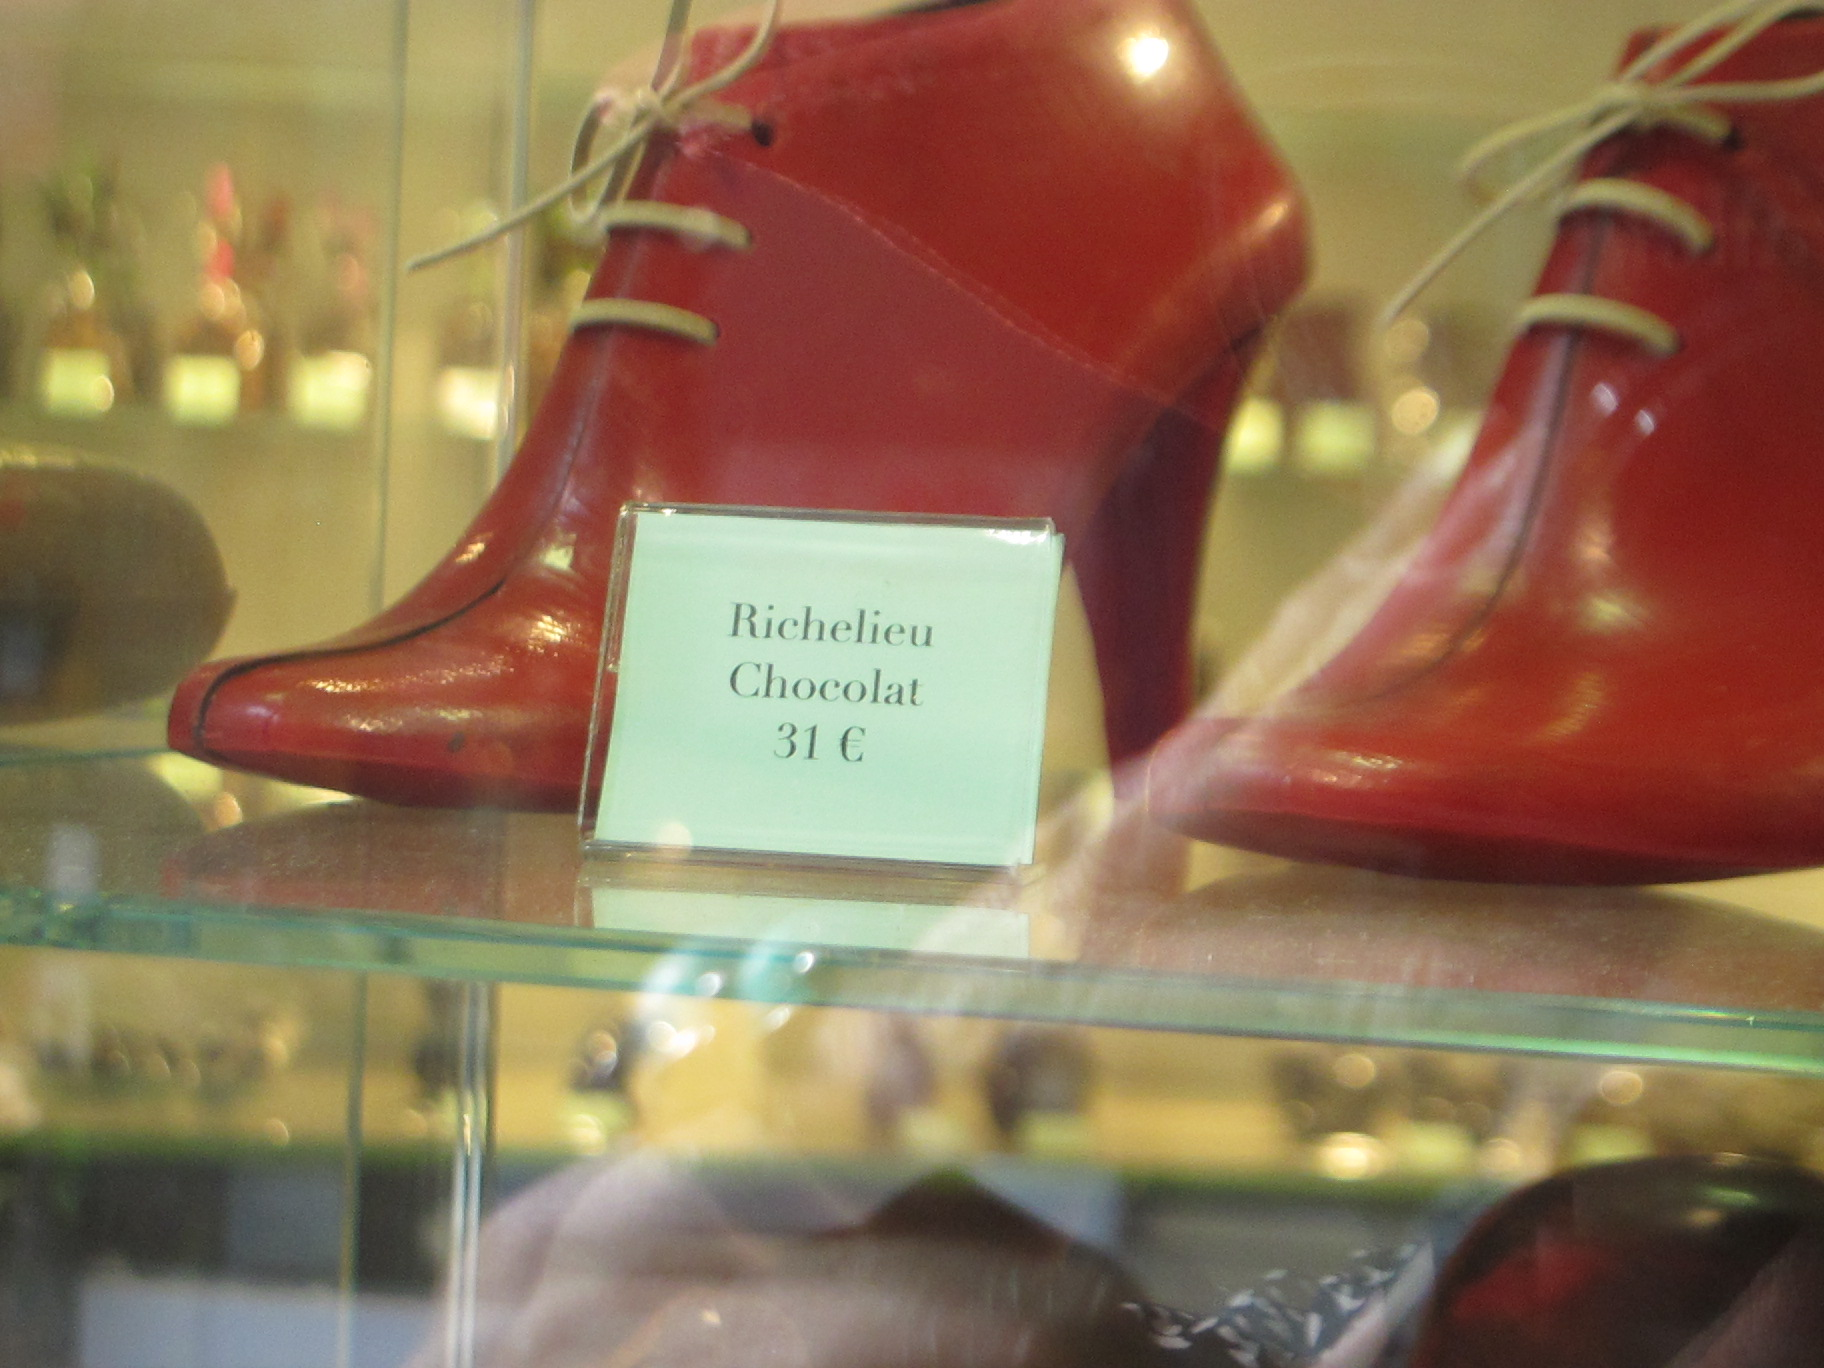 Richelieu Chocolat,  these shoes were made for eating. Photo: Elizabeth Kemble.